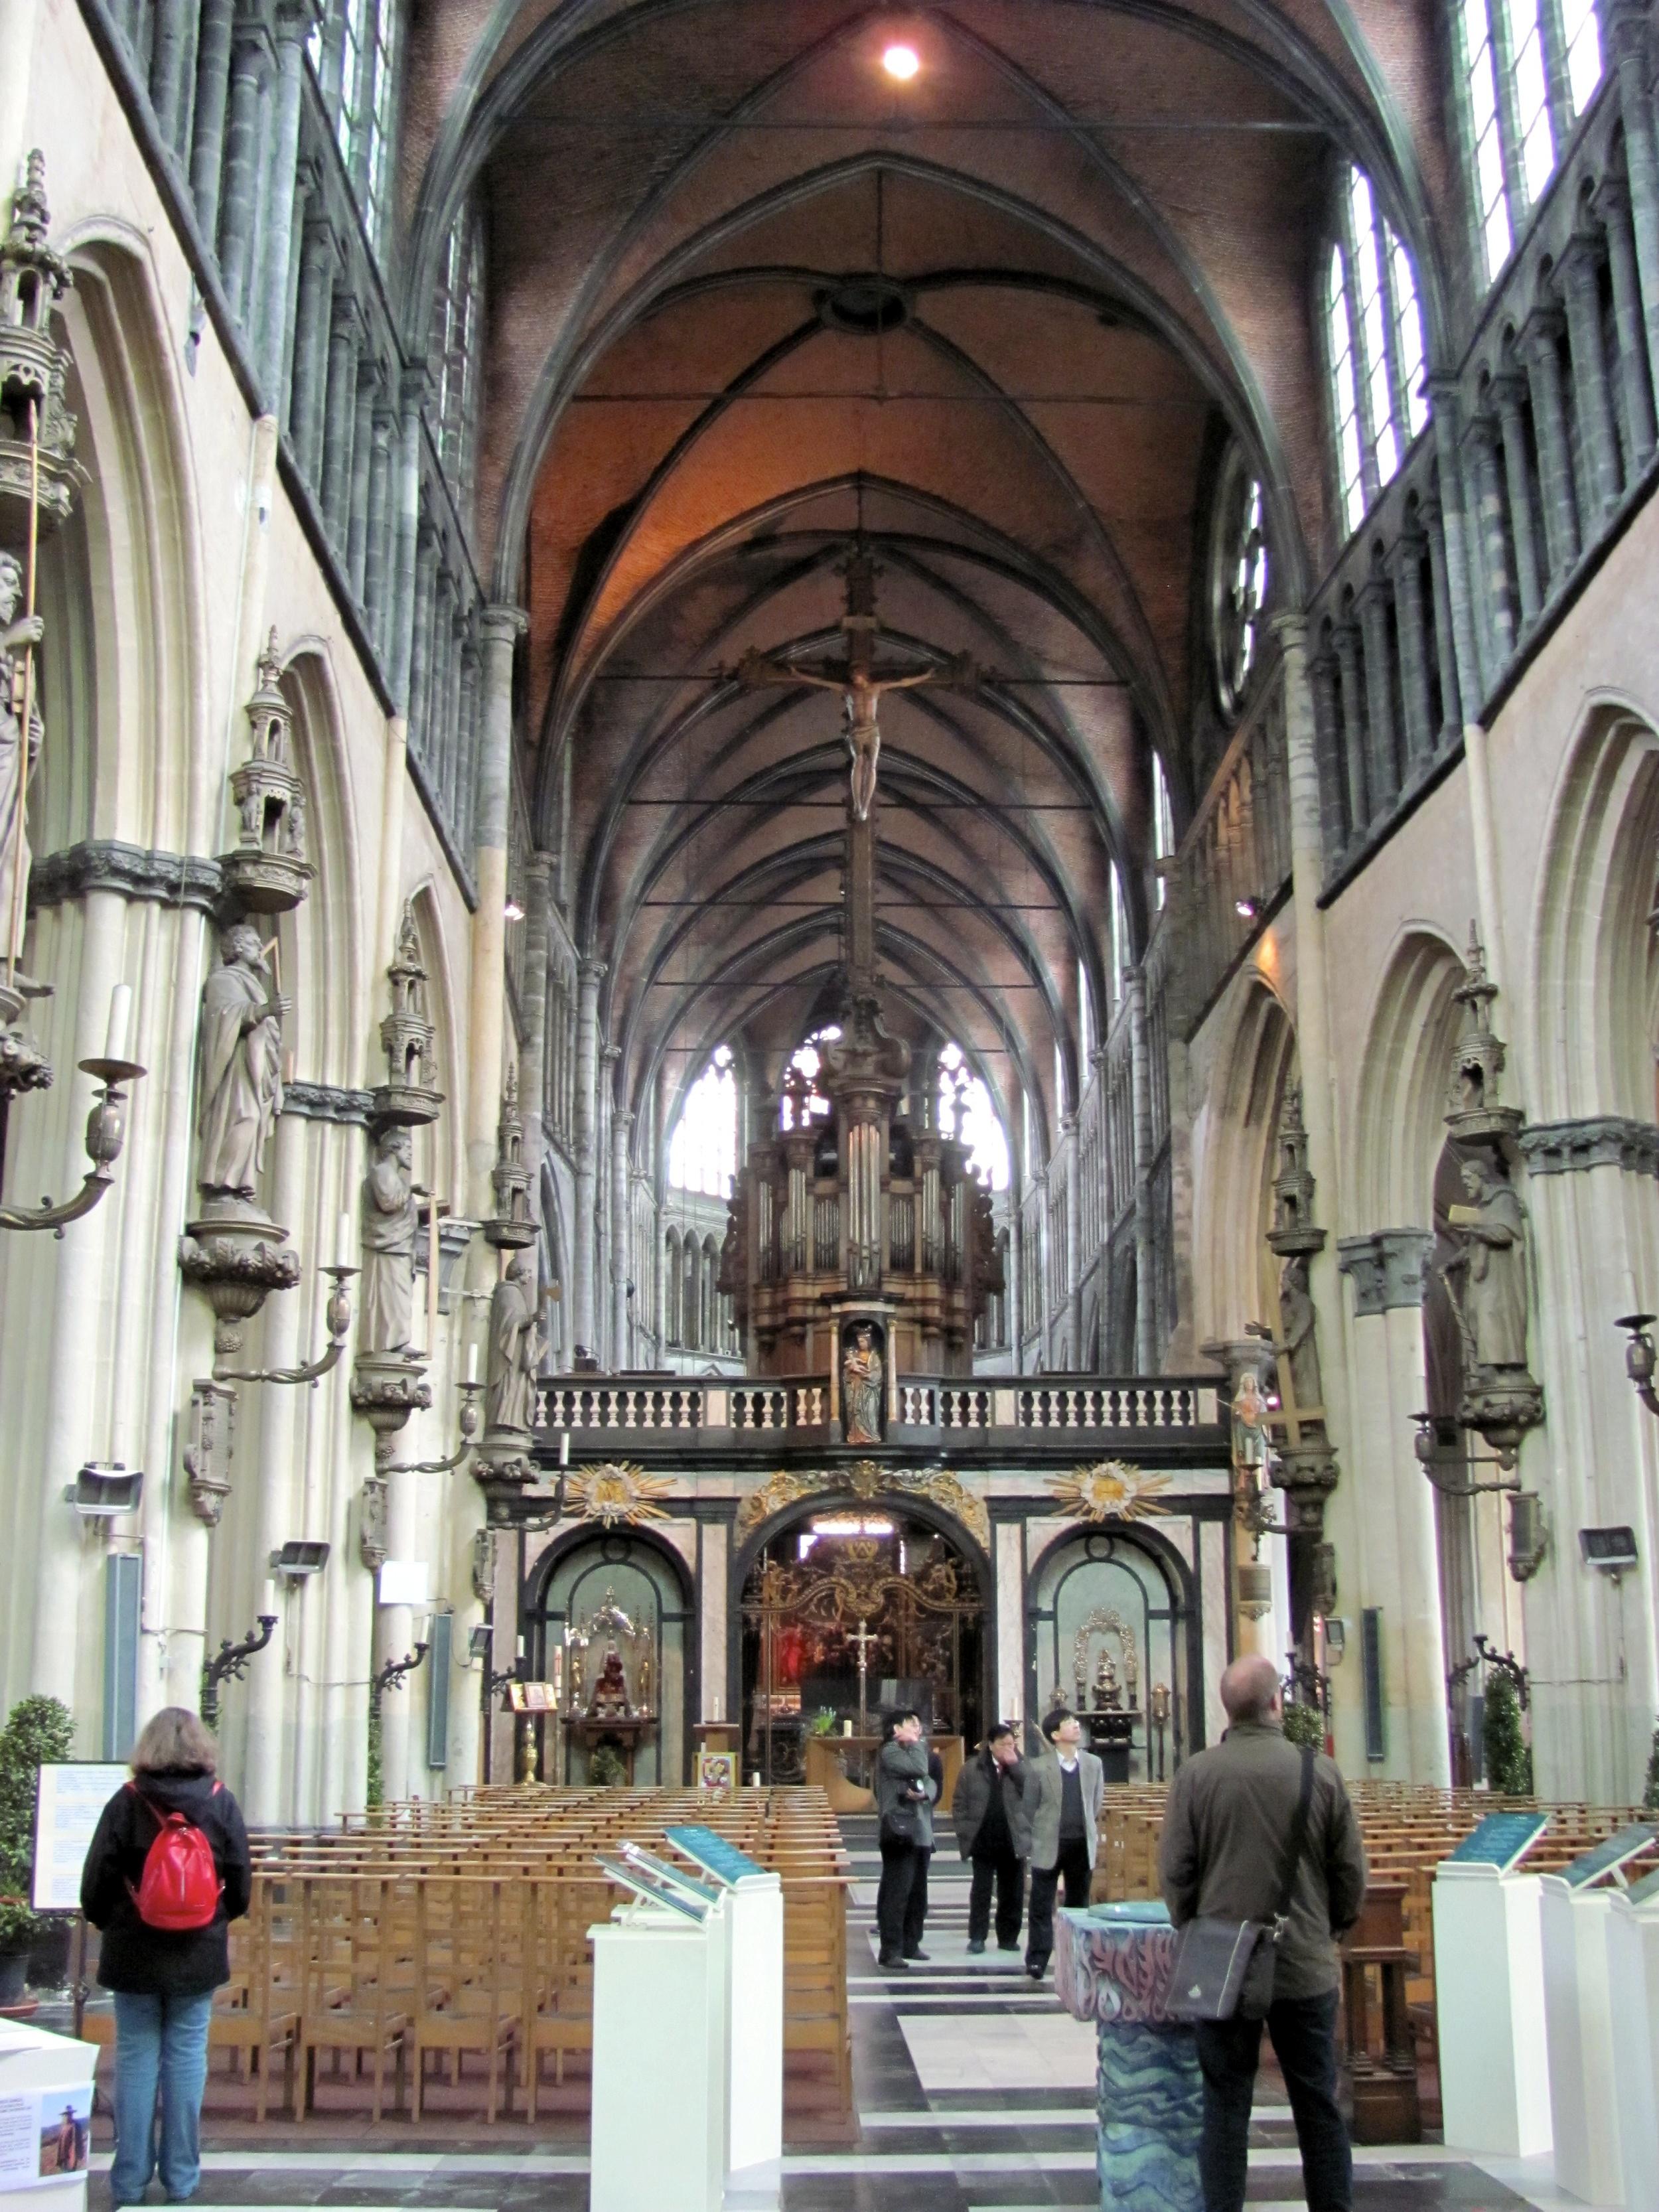 Sint-Salvatorskathedraal, Bruges, Belgium, VHS 2010